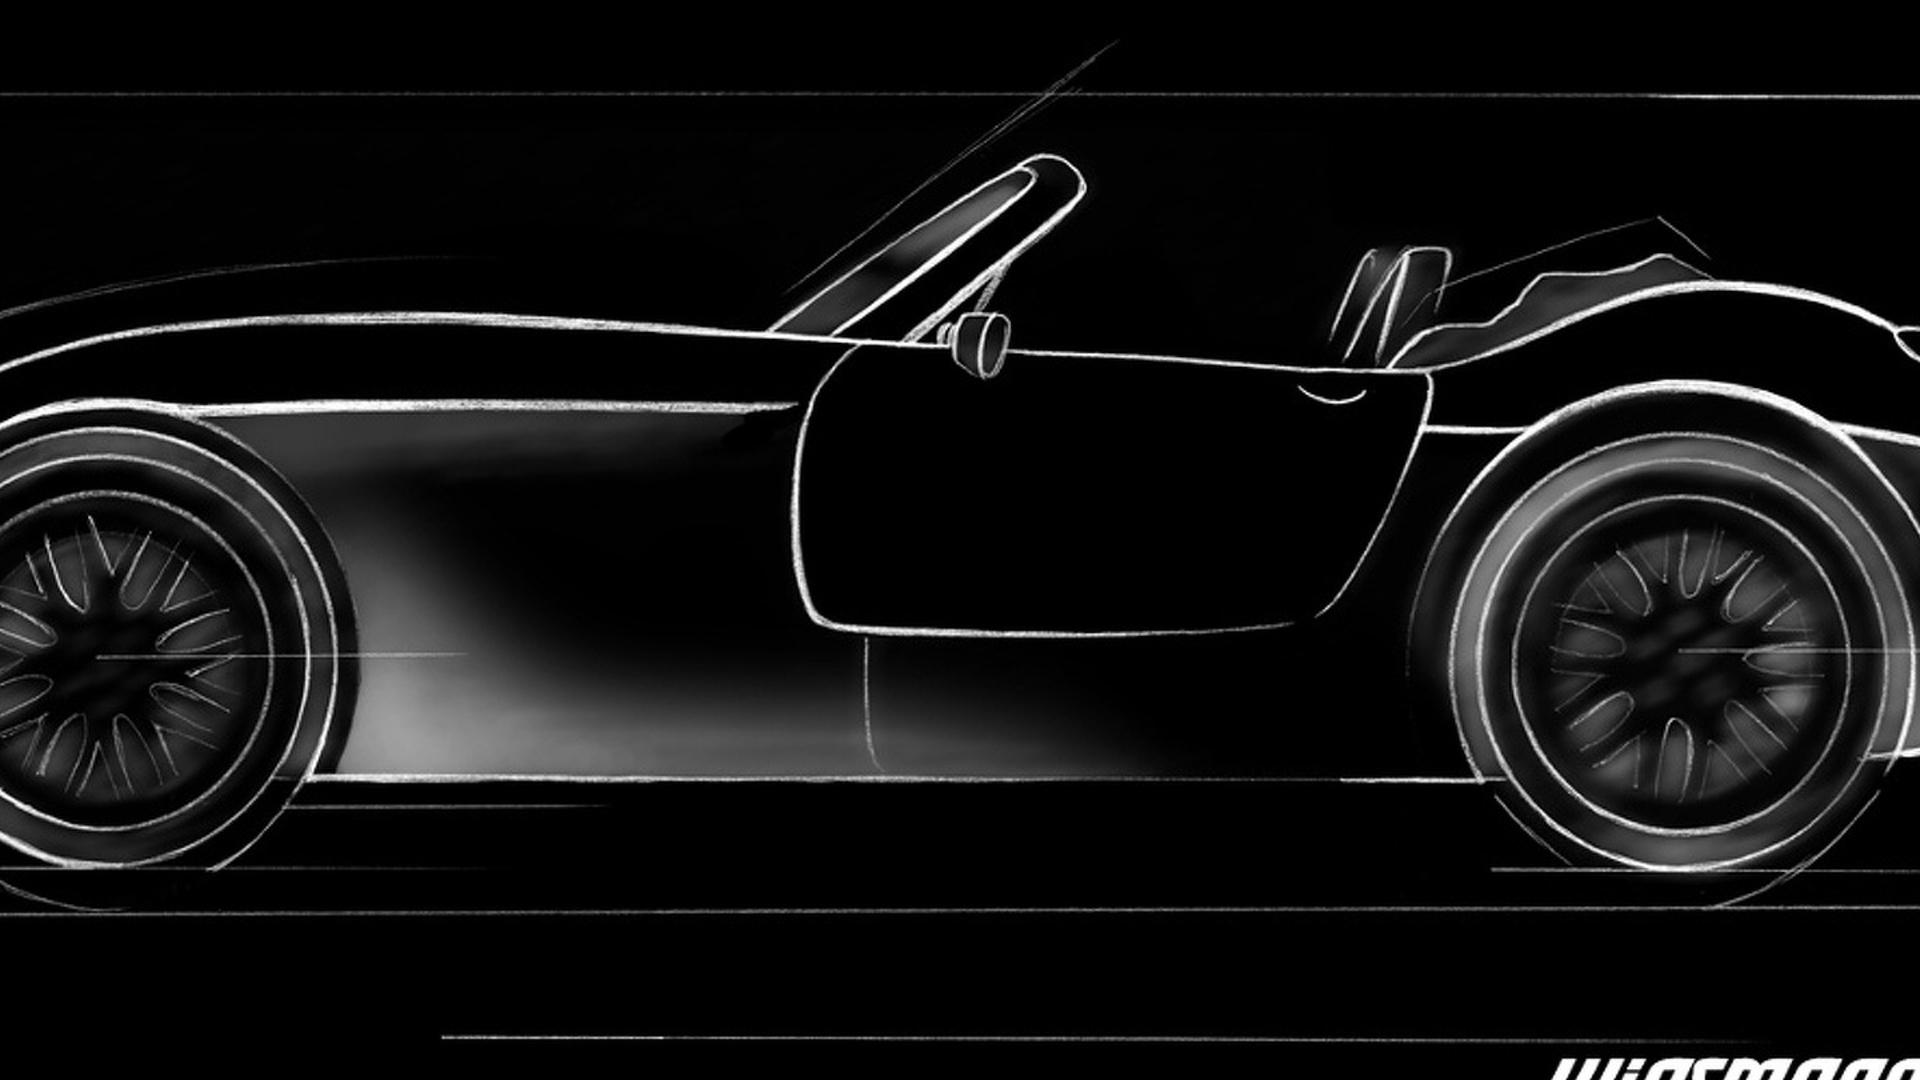 Wiesmann Roadster MF4 to Debut in Geneva: Teaser Released